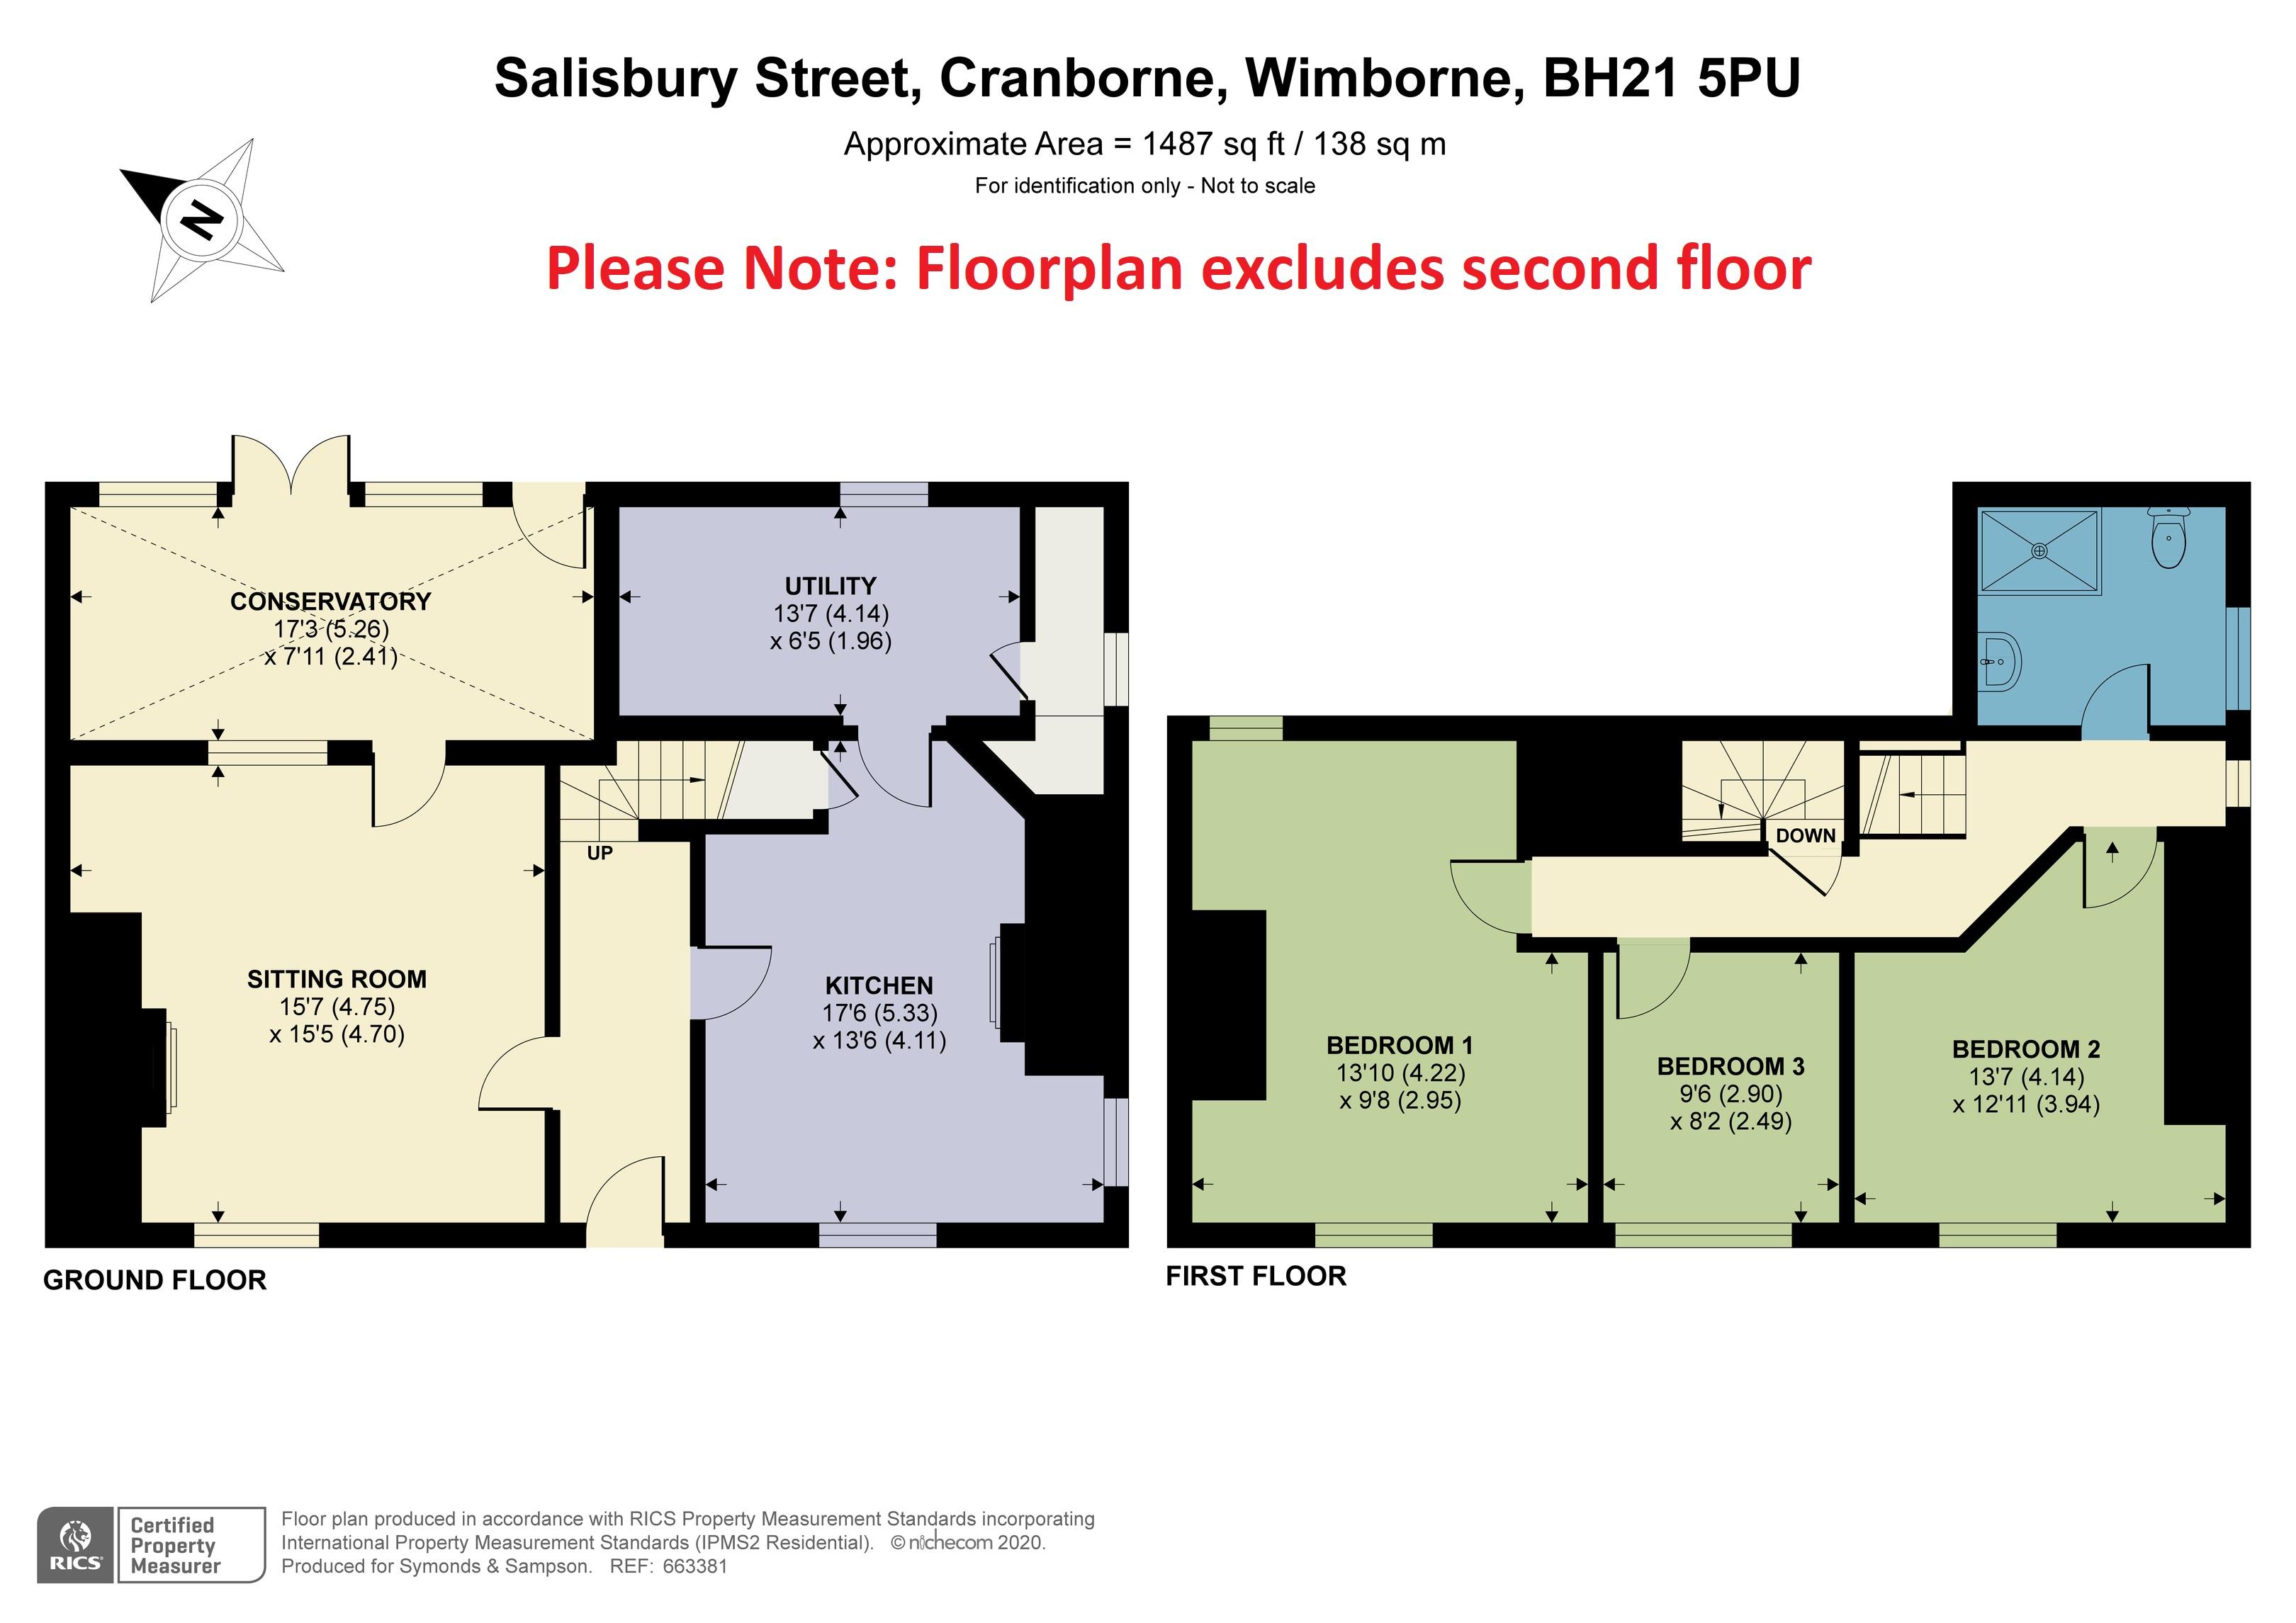 Floorplan - Salisbury Street, Cranborne, Wimborne, BH21 5PU